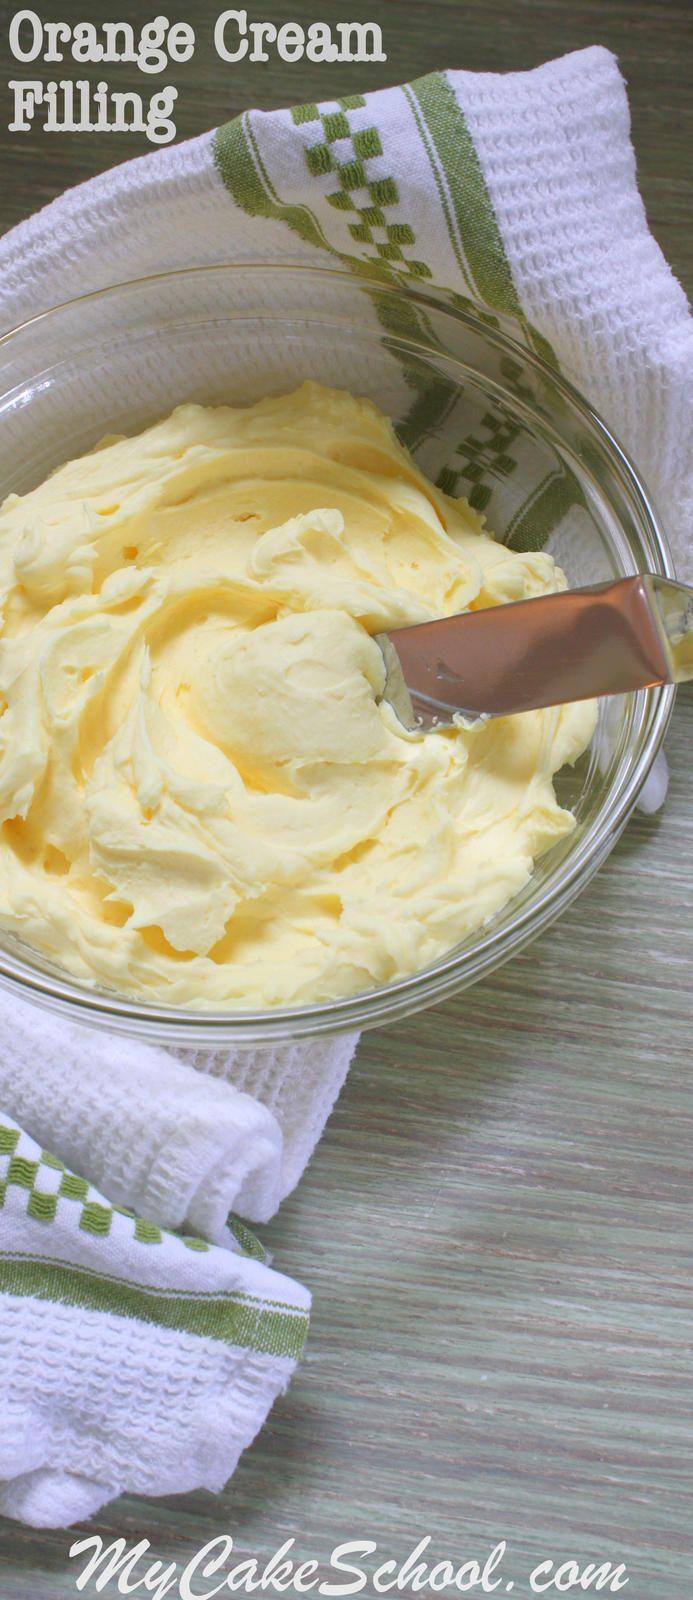 Delicious Orange Cream Filling! Recipe by MyCakeSchool.com. Online Cake Tutorials & Recipes!